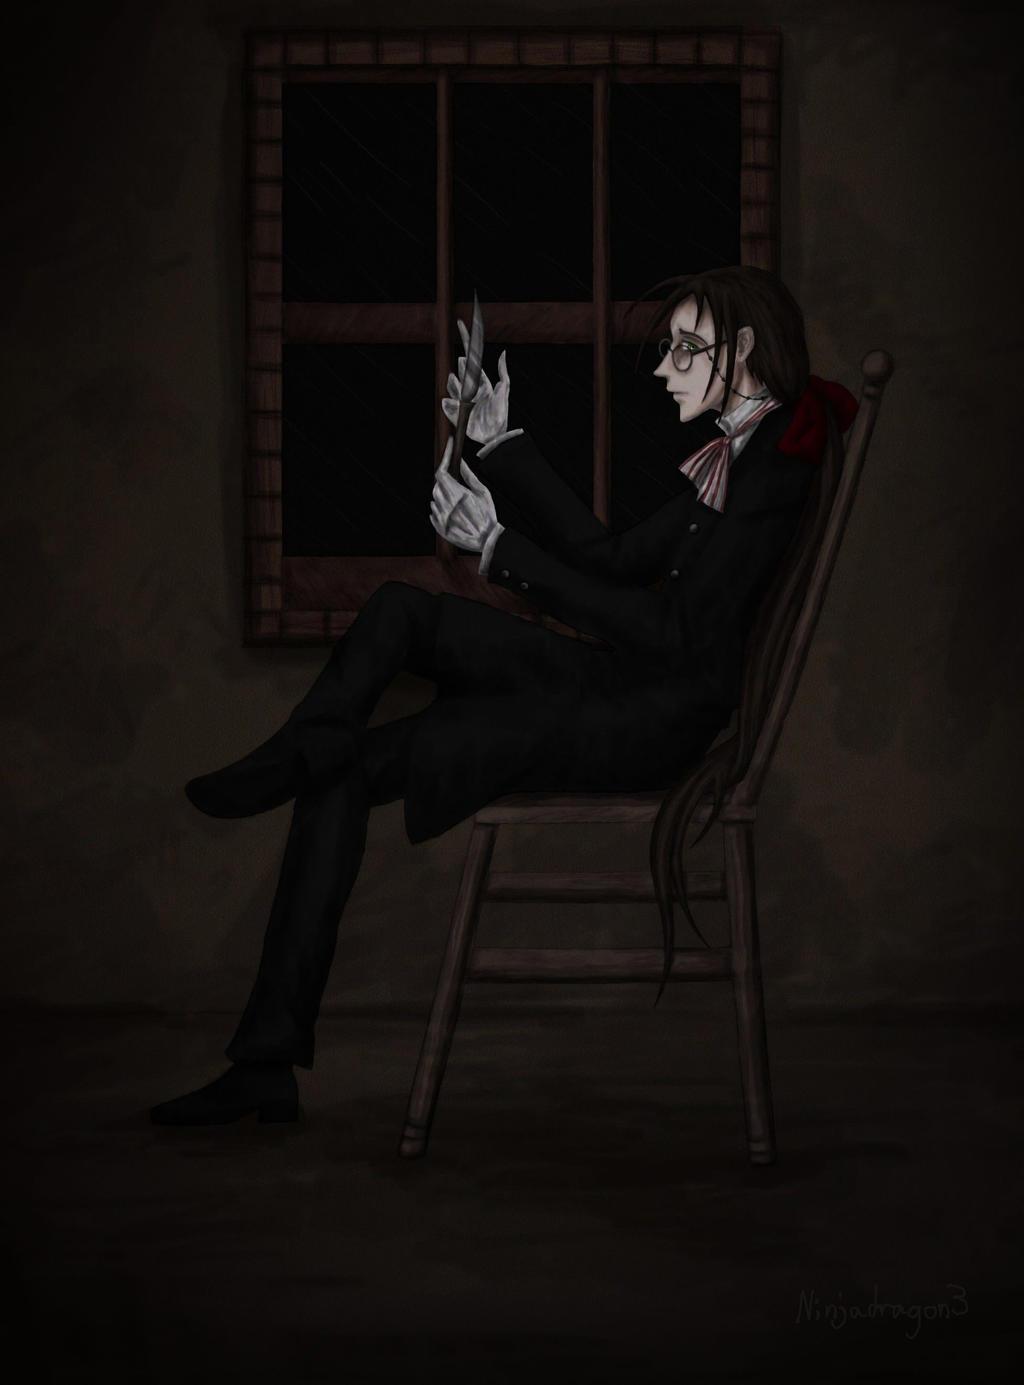 Jack the Ripper (Kuro) by NinjaDragon3